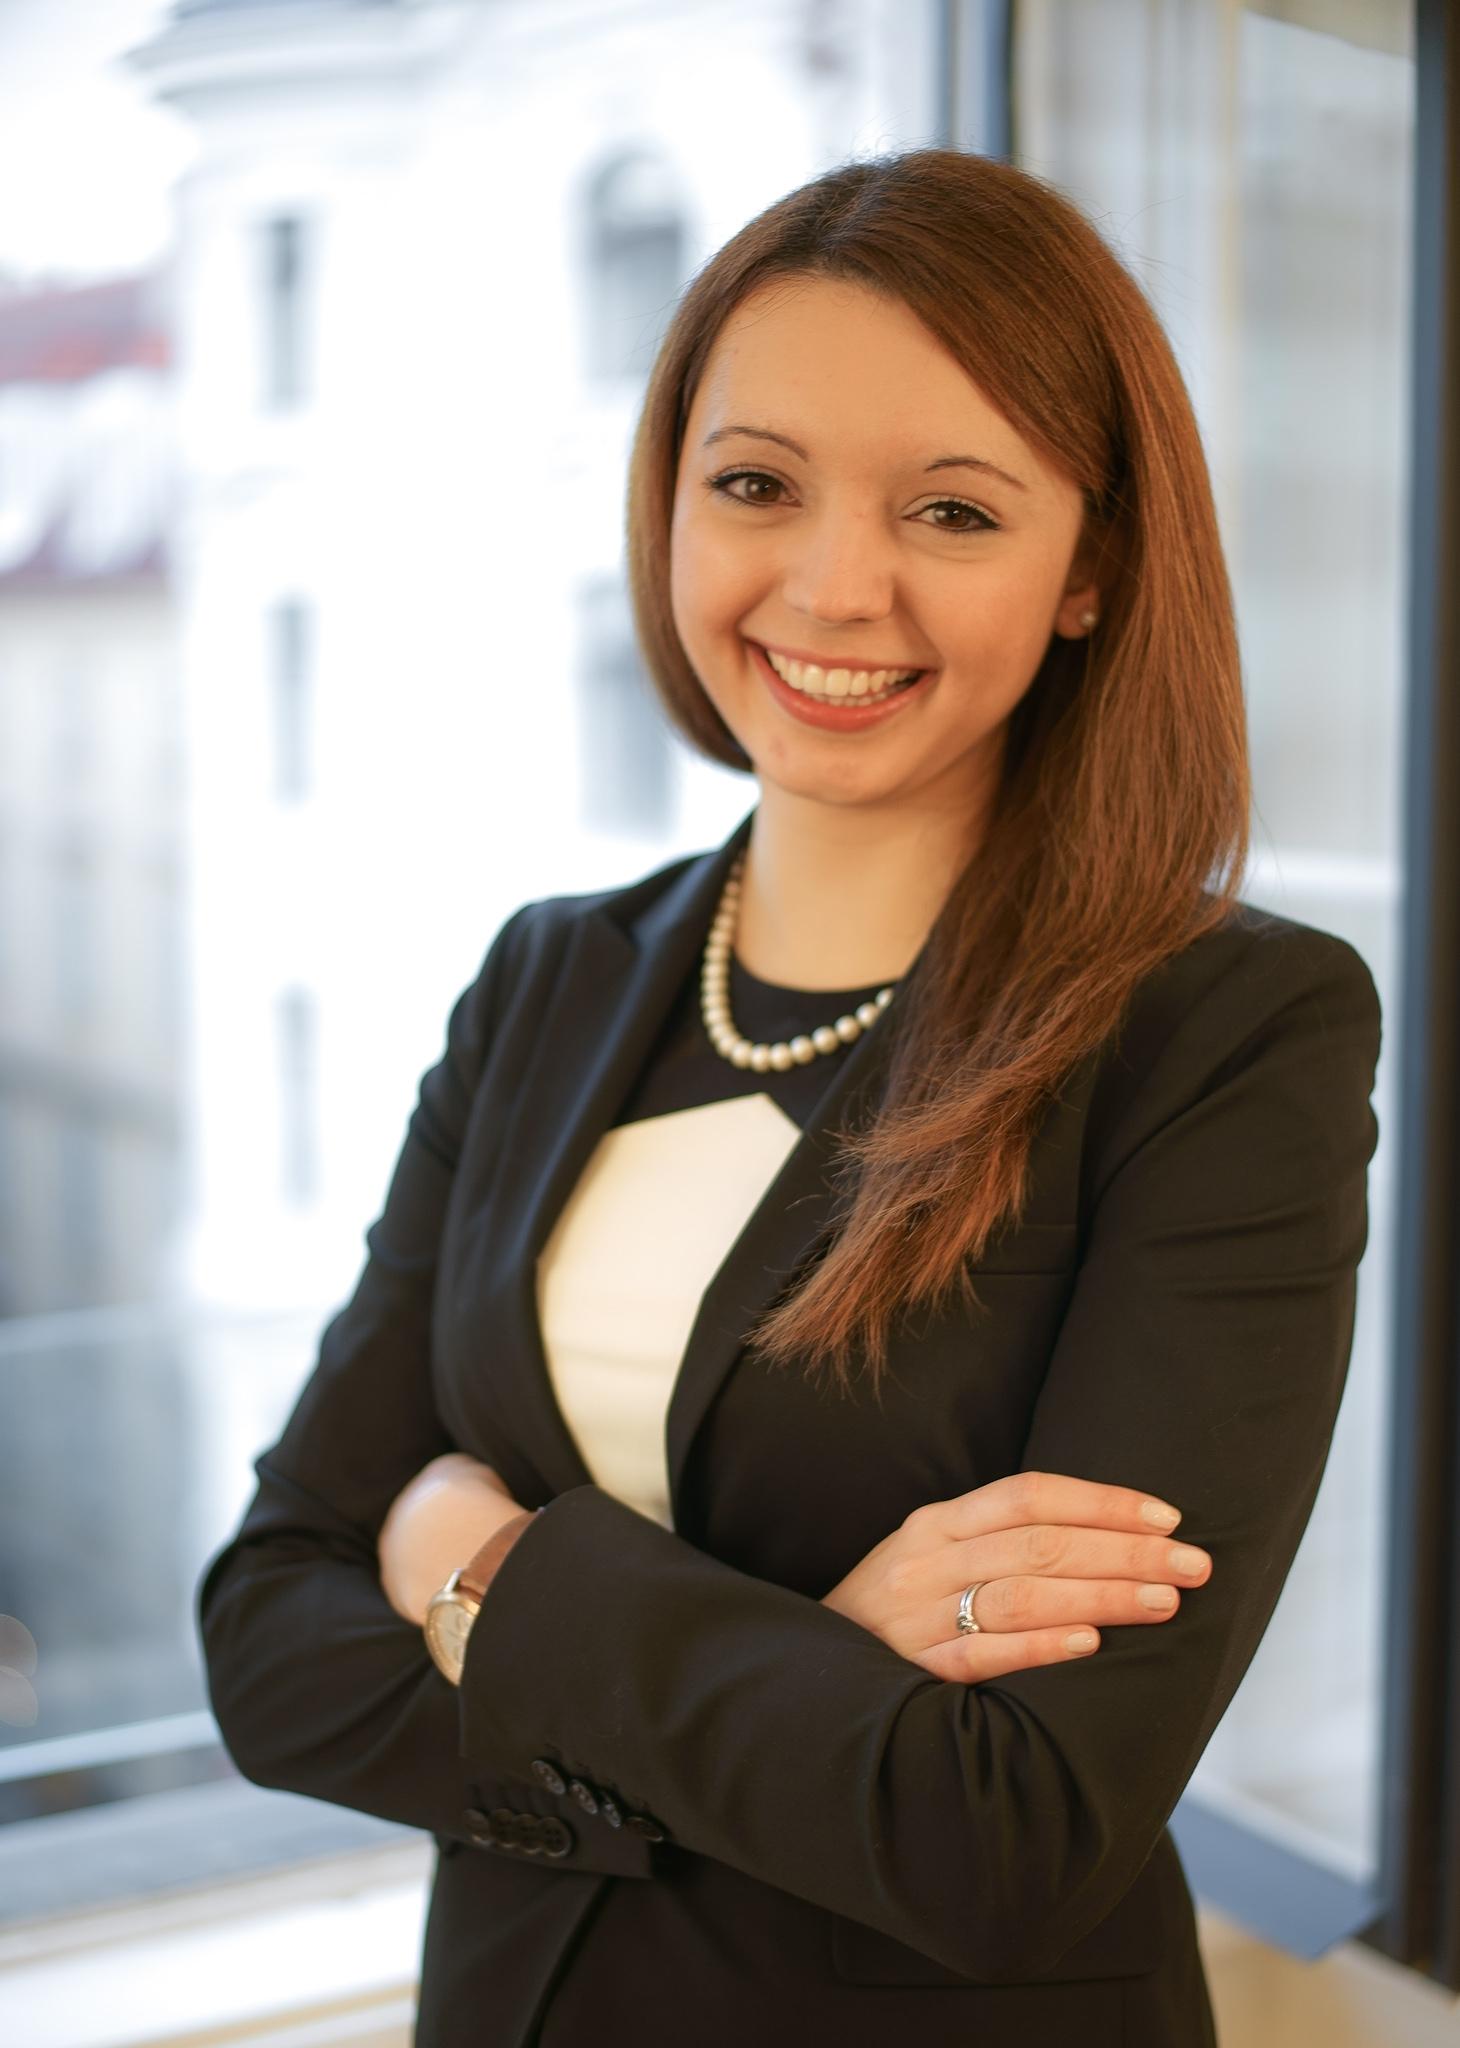 Yasmin Fradinger